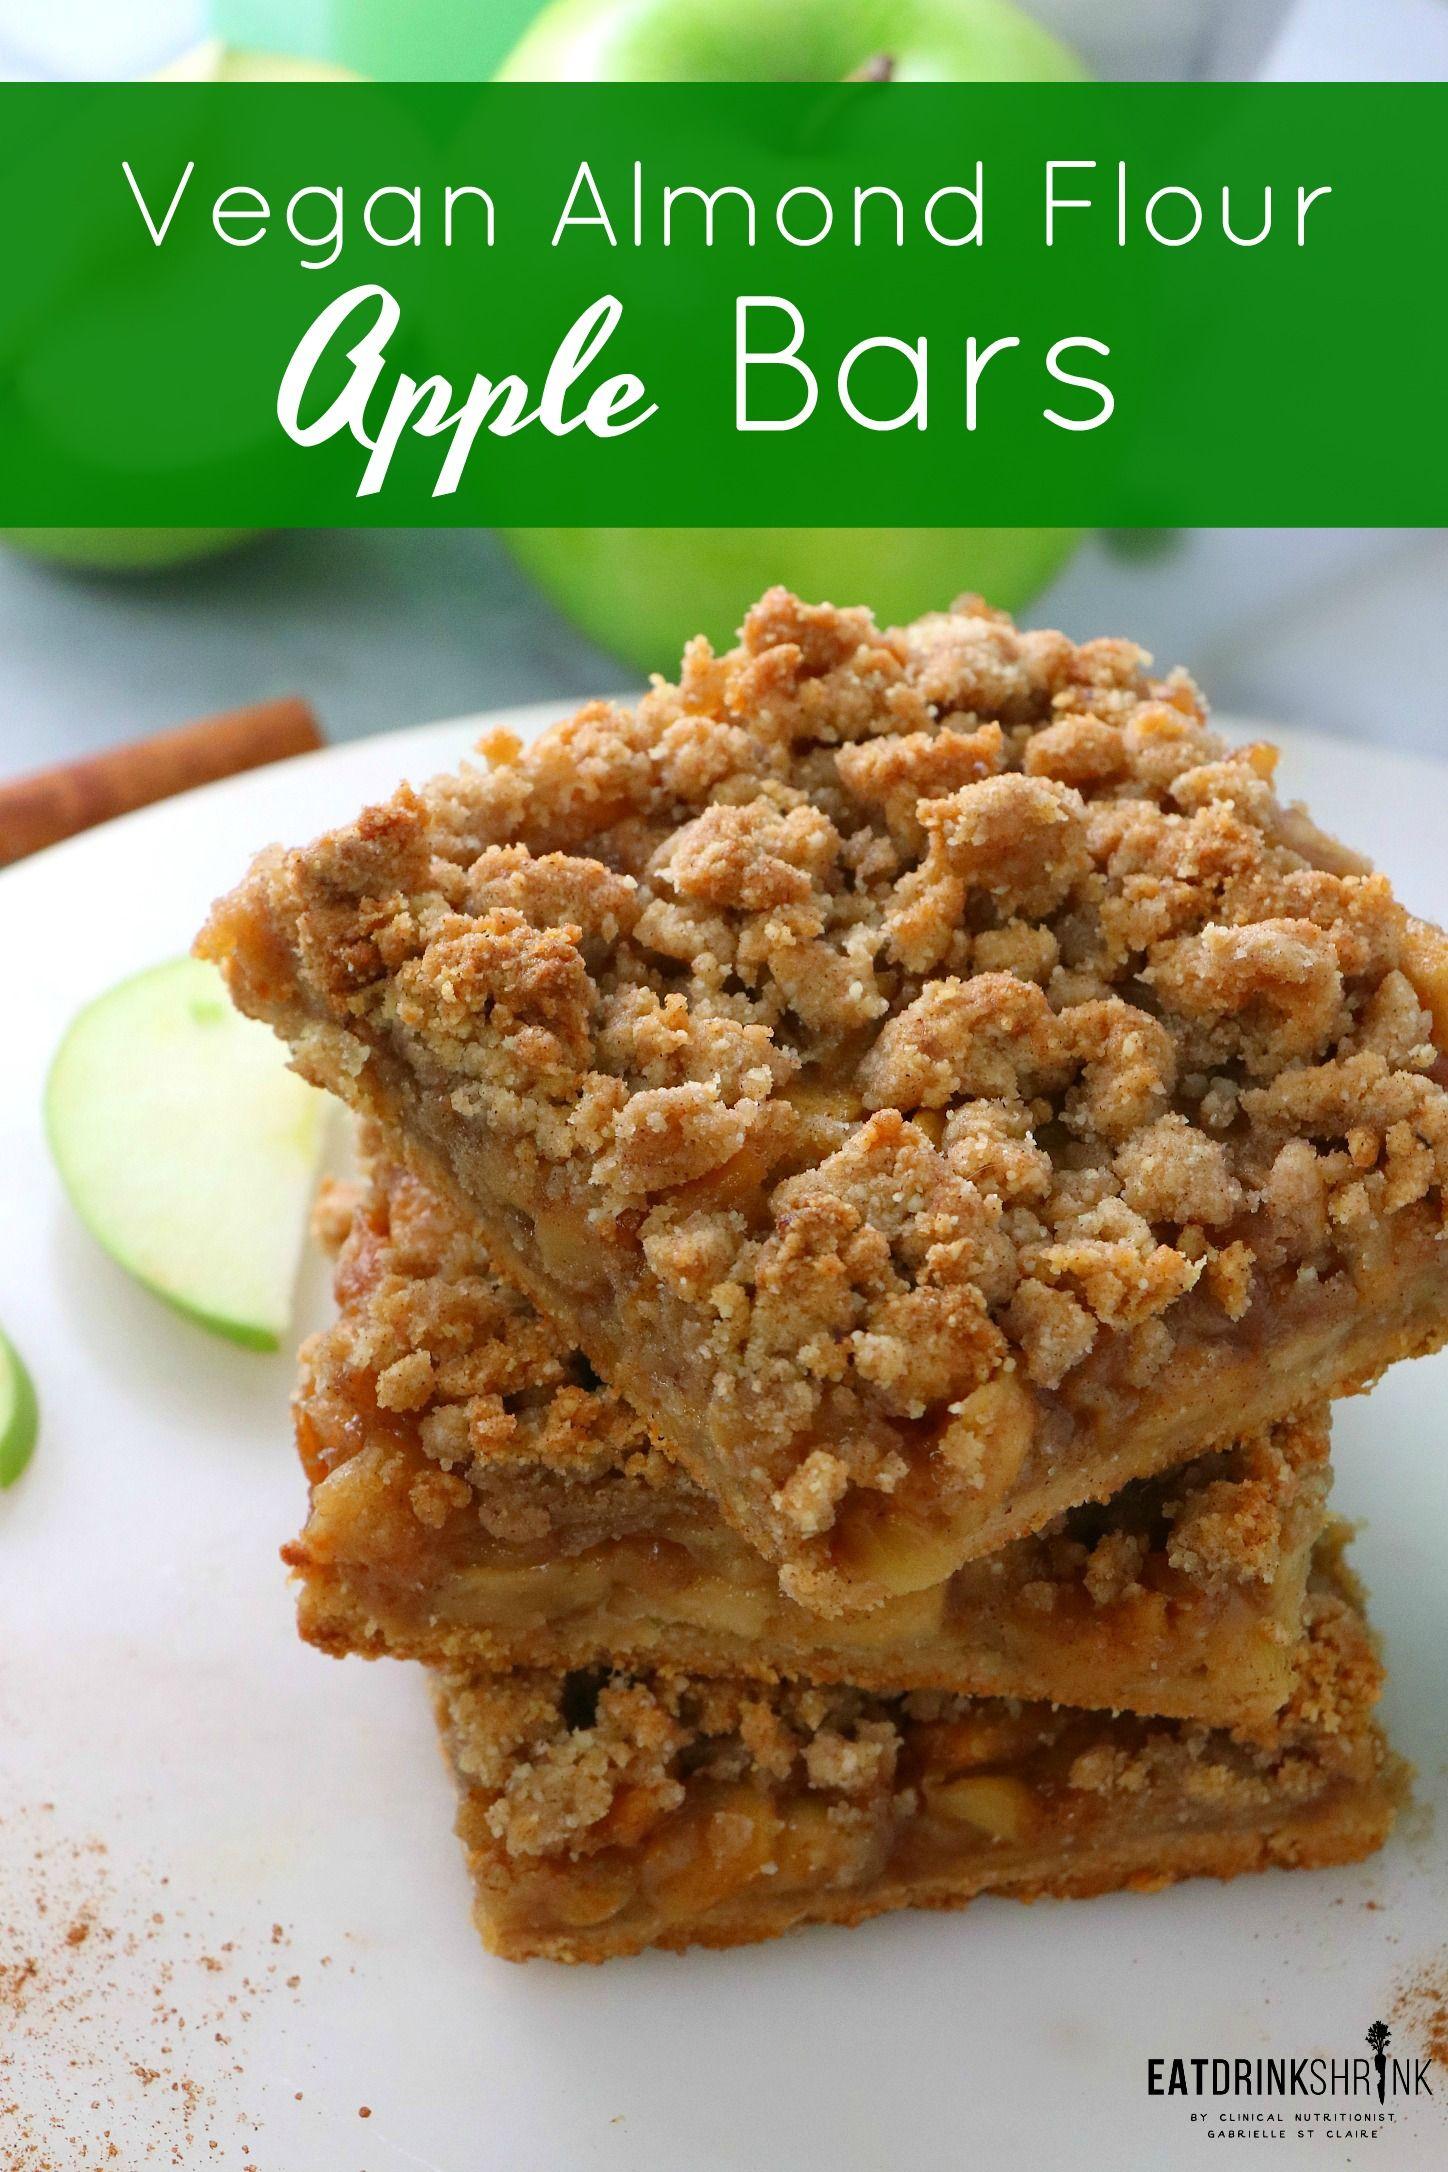 Vegan Almond Flour Apple Bars Eat Drink Shrink Recipe Vegan Apple Dessert Almond Flour Food